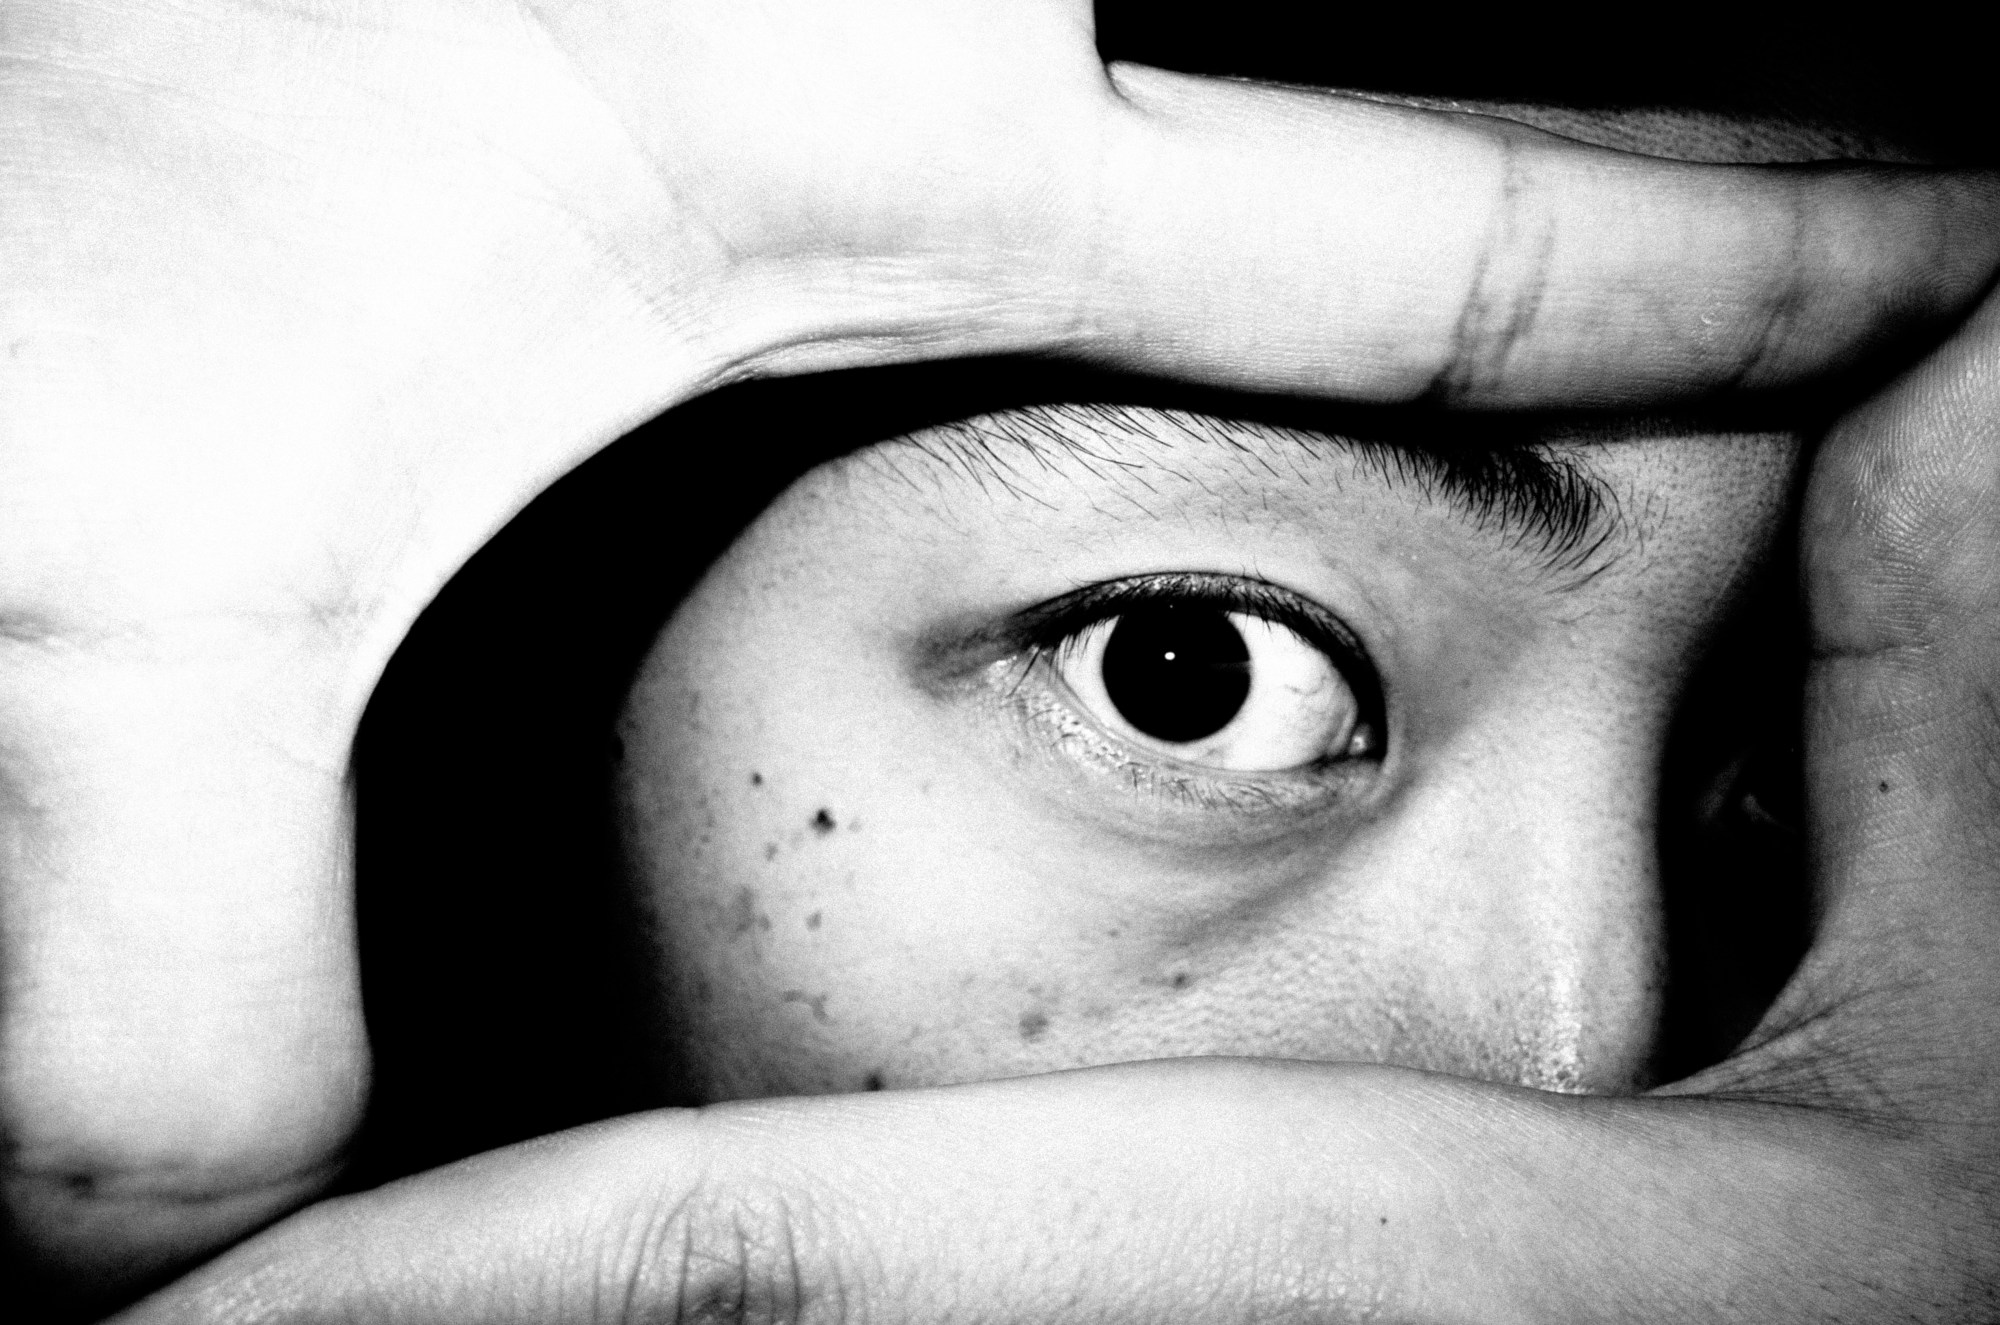 eric-kim-black-and-white-street-photography-hanoi-0012086-EYE-ERIC